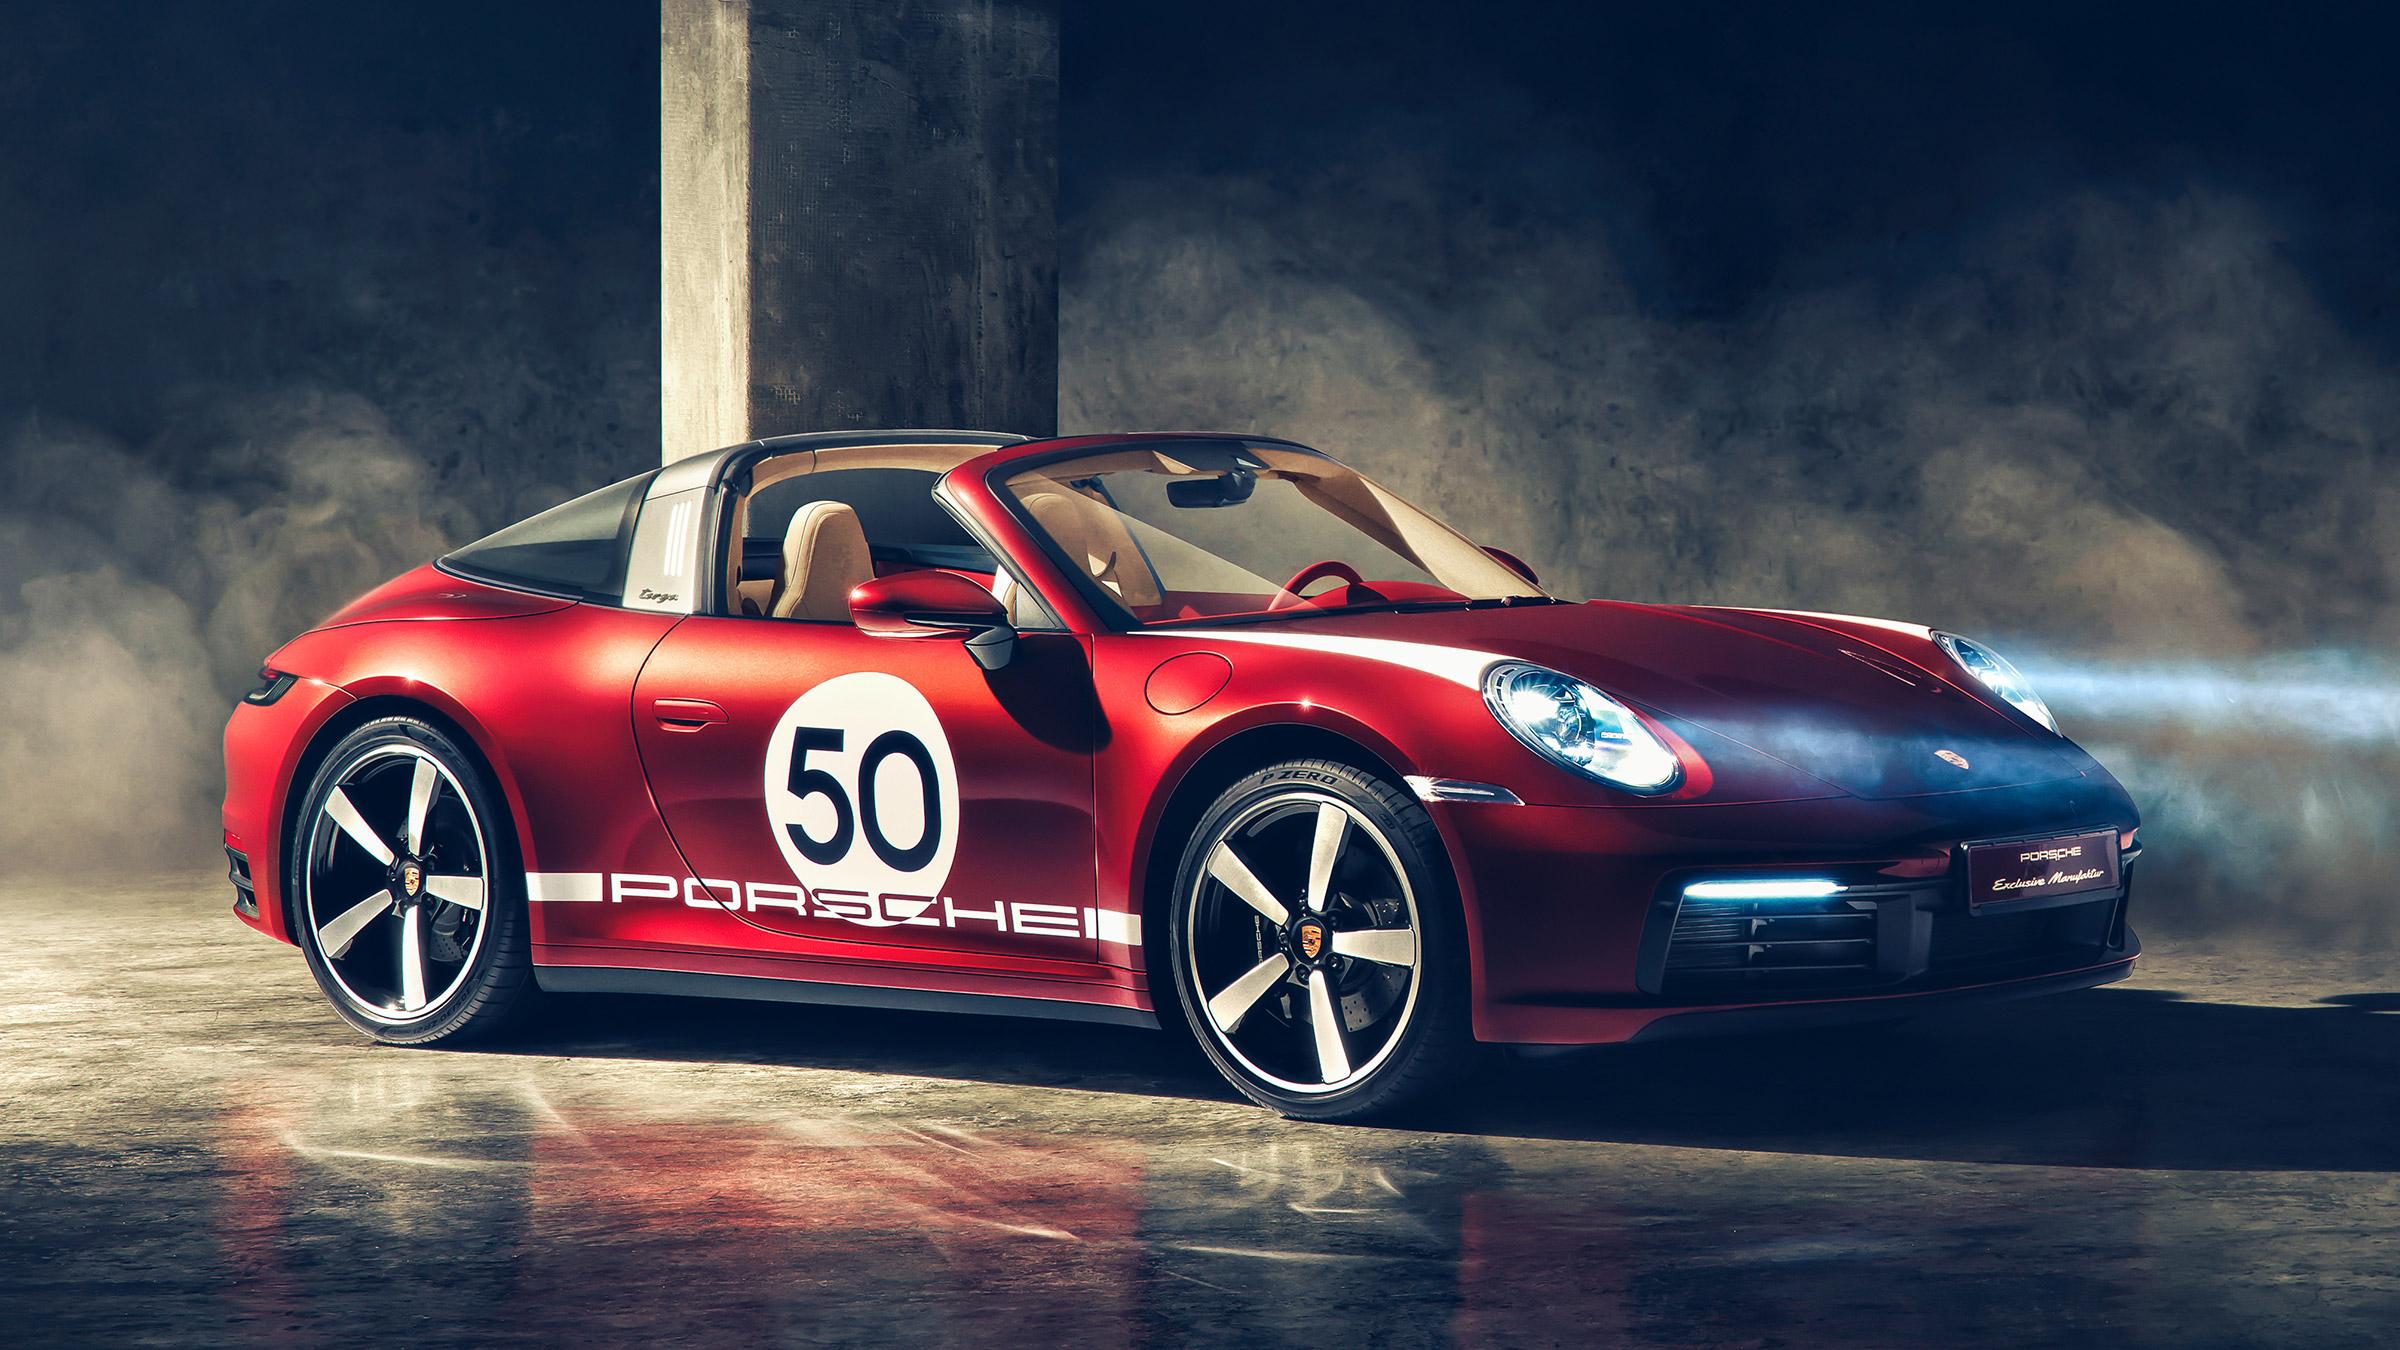 New Porsche 911 Targa 4S Heritage Edition launched | Auto ...